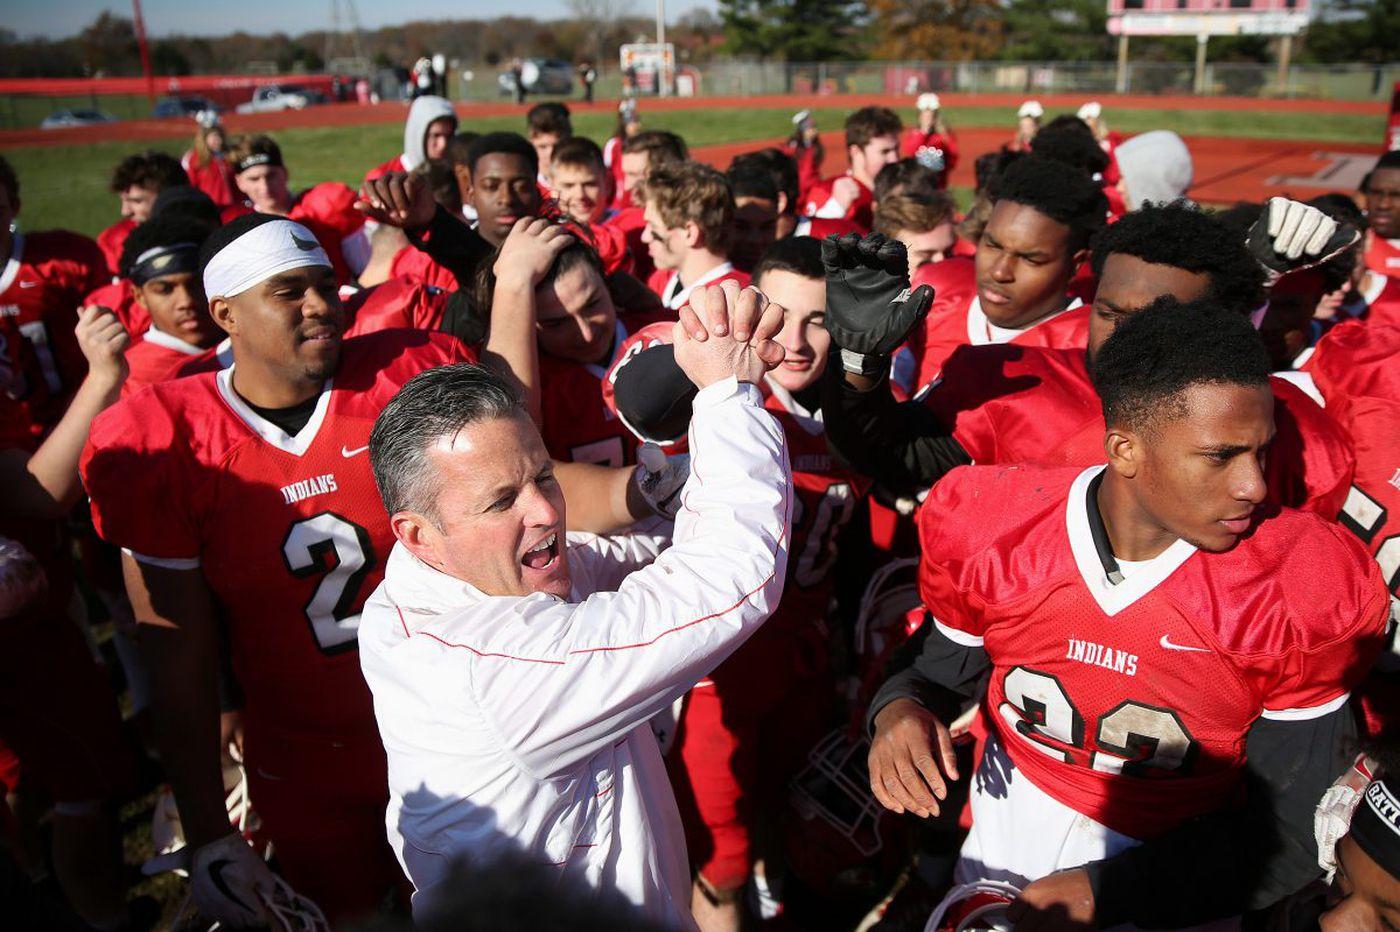 Tim McAneney resigns as Lenape football coach